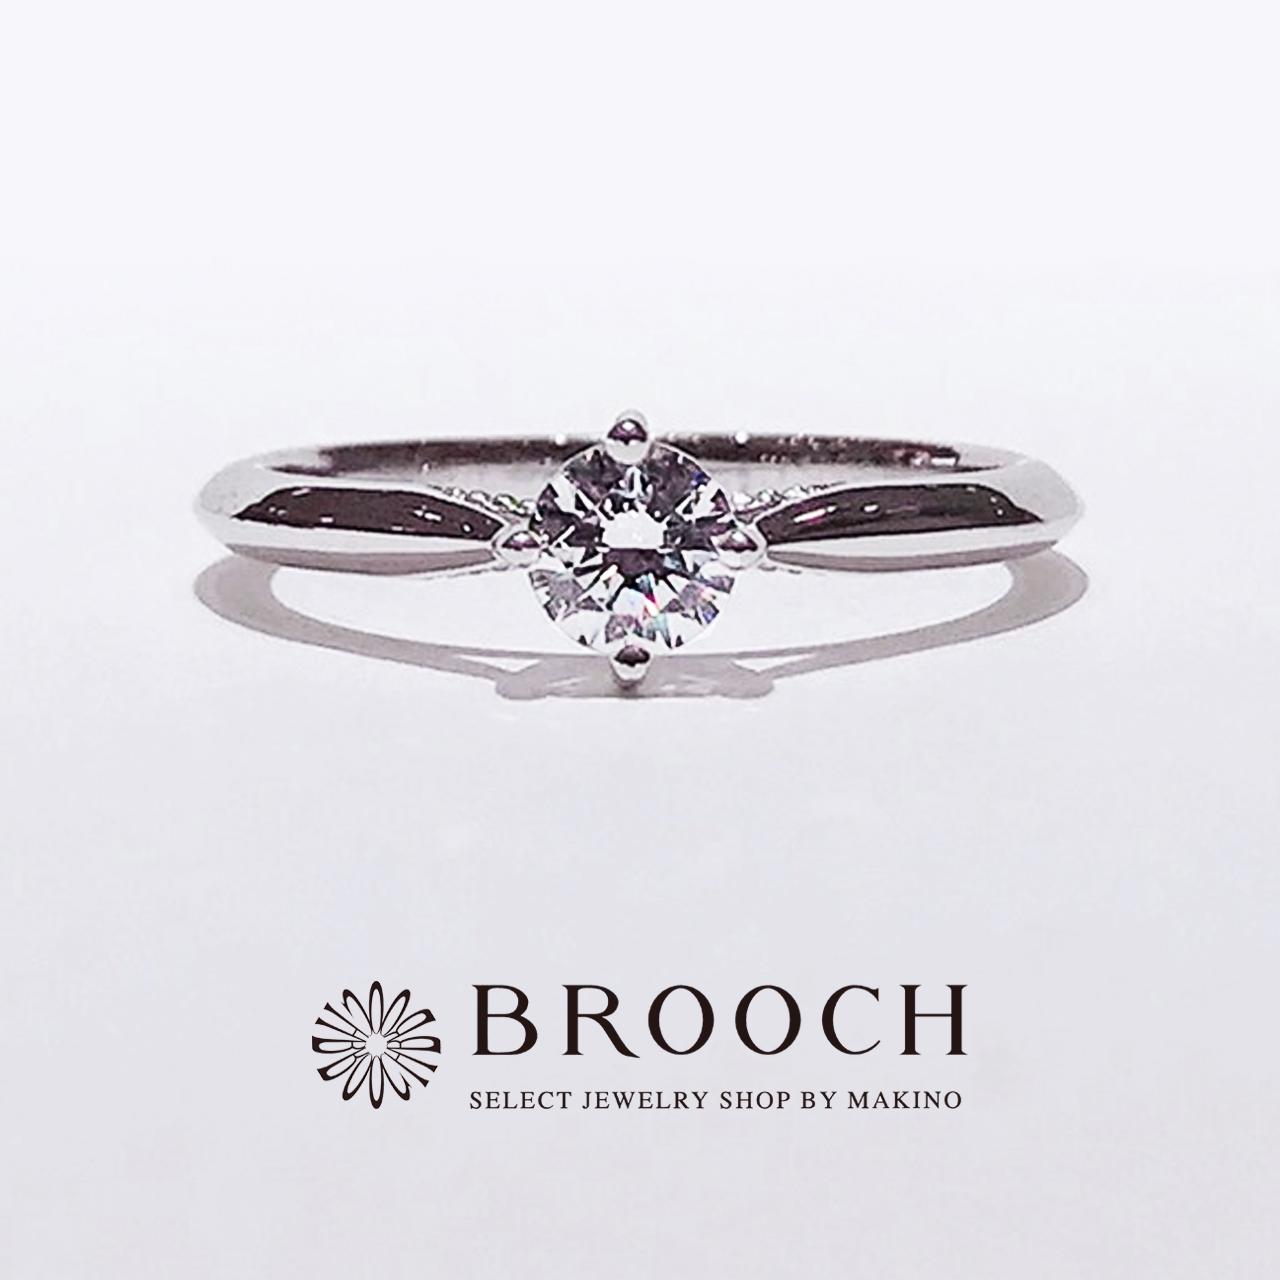 BROOCH 婚約指輪 エンゲージリング シンプルストレートサイドミルデザイン